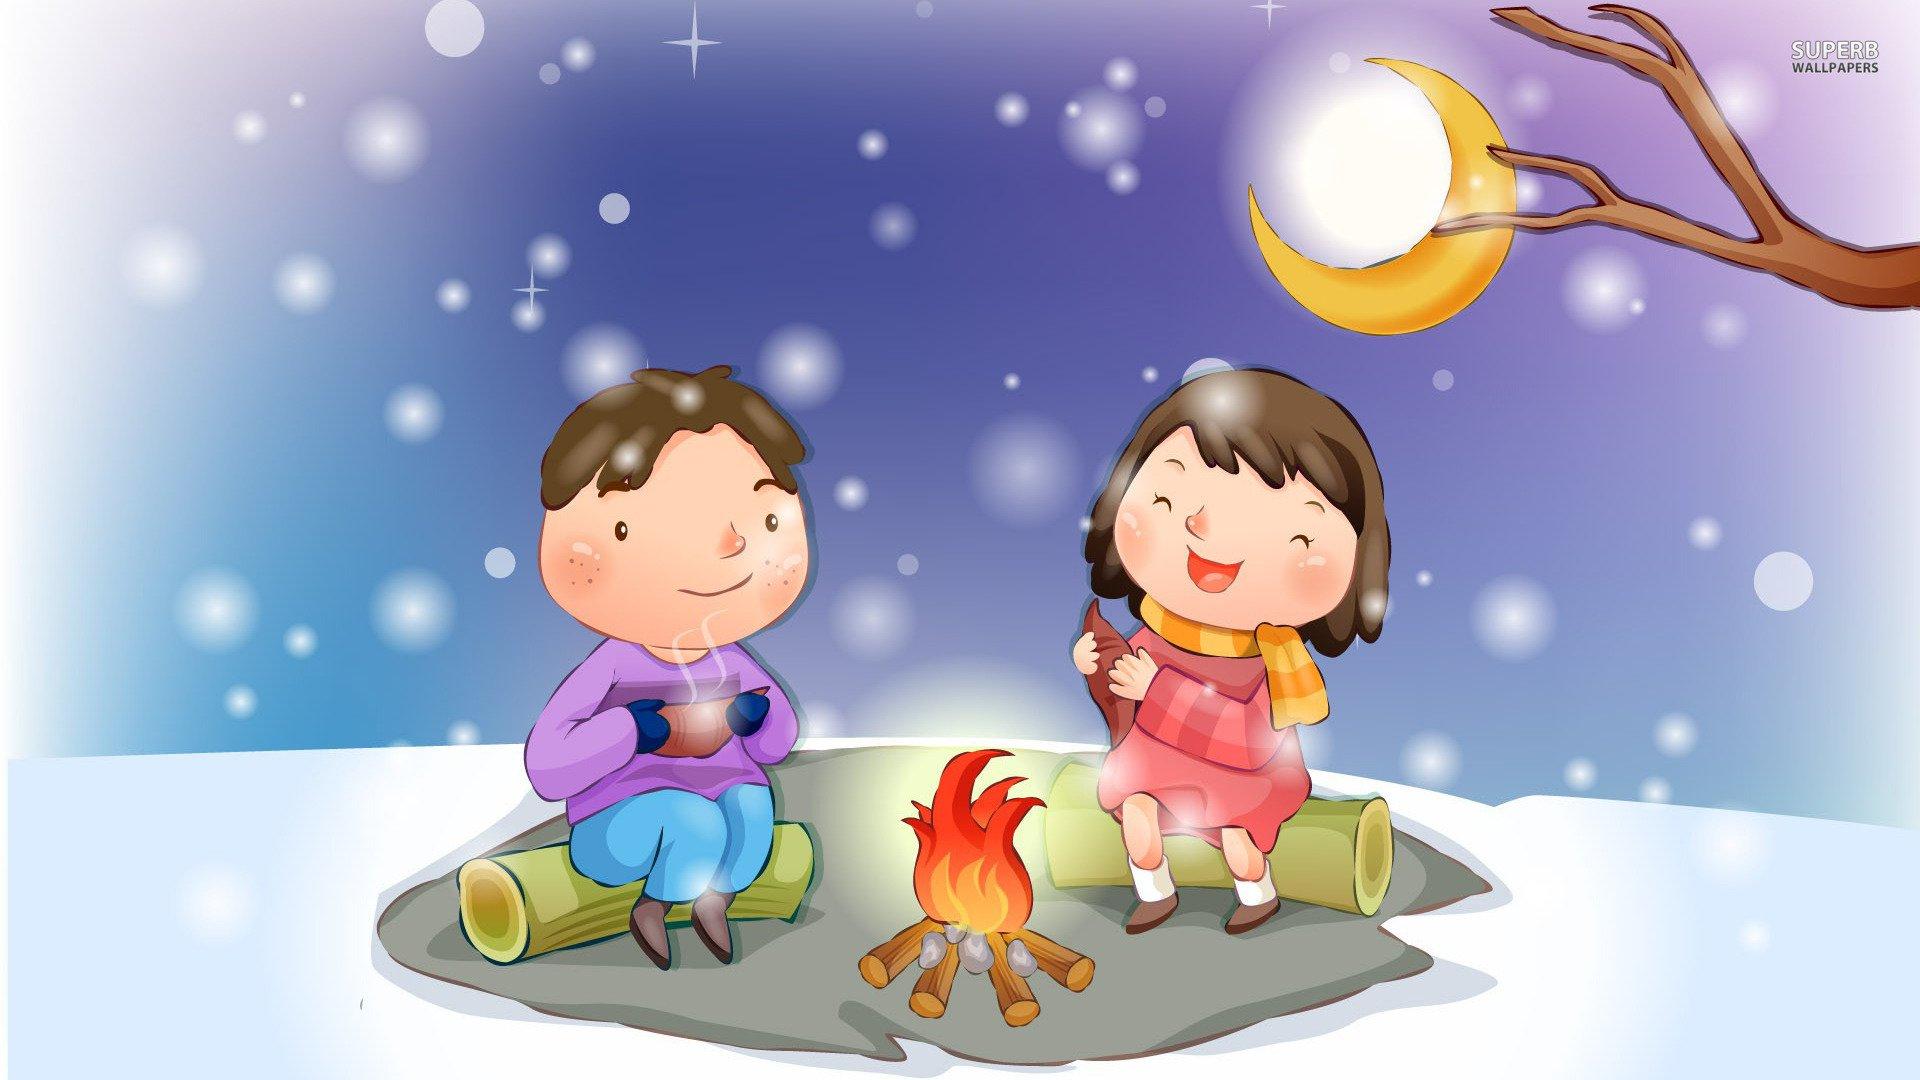 Bonfire clipart winter In Bonfire Bonfire Snow 495254